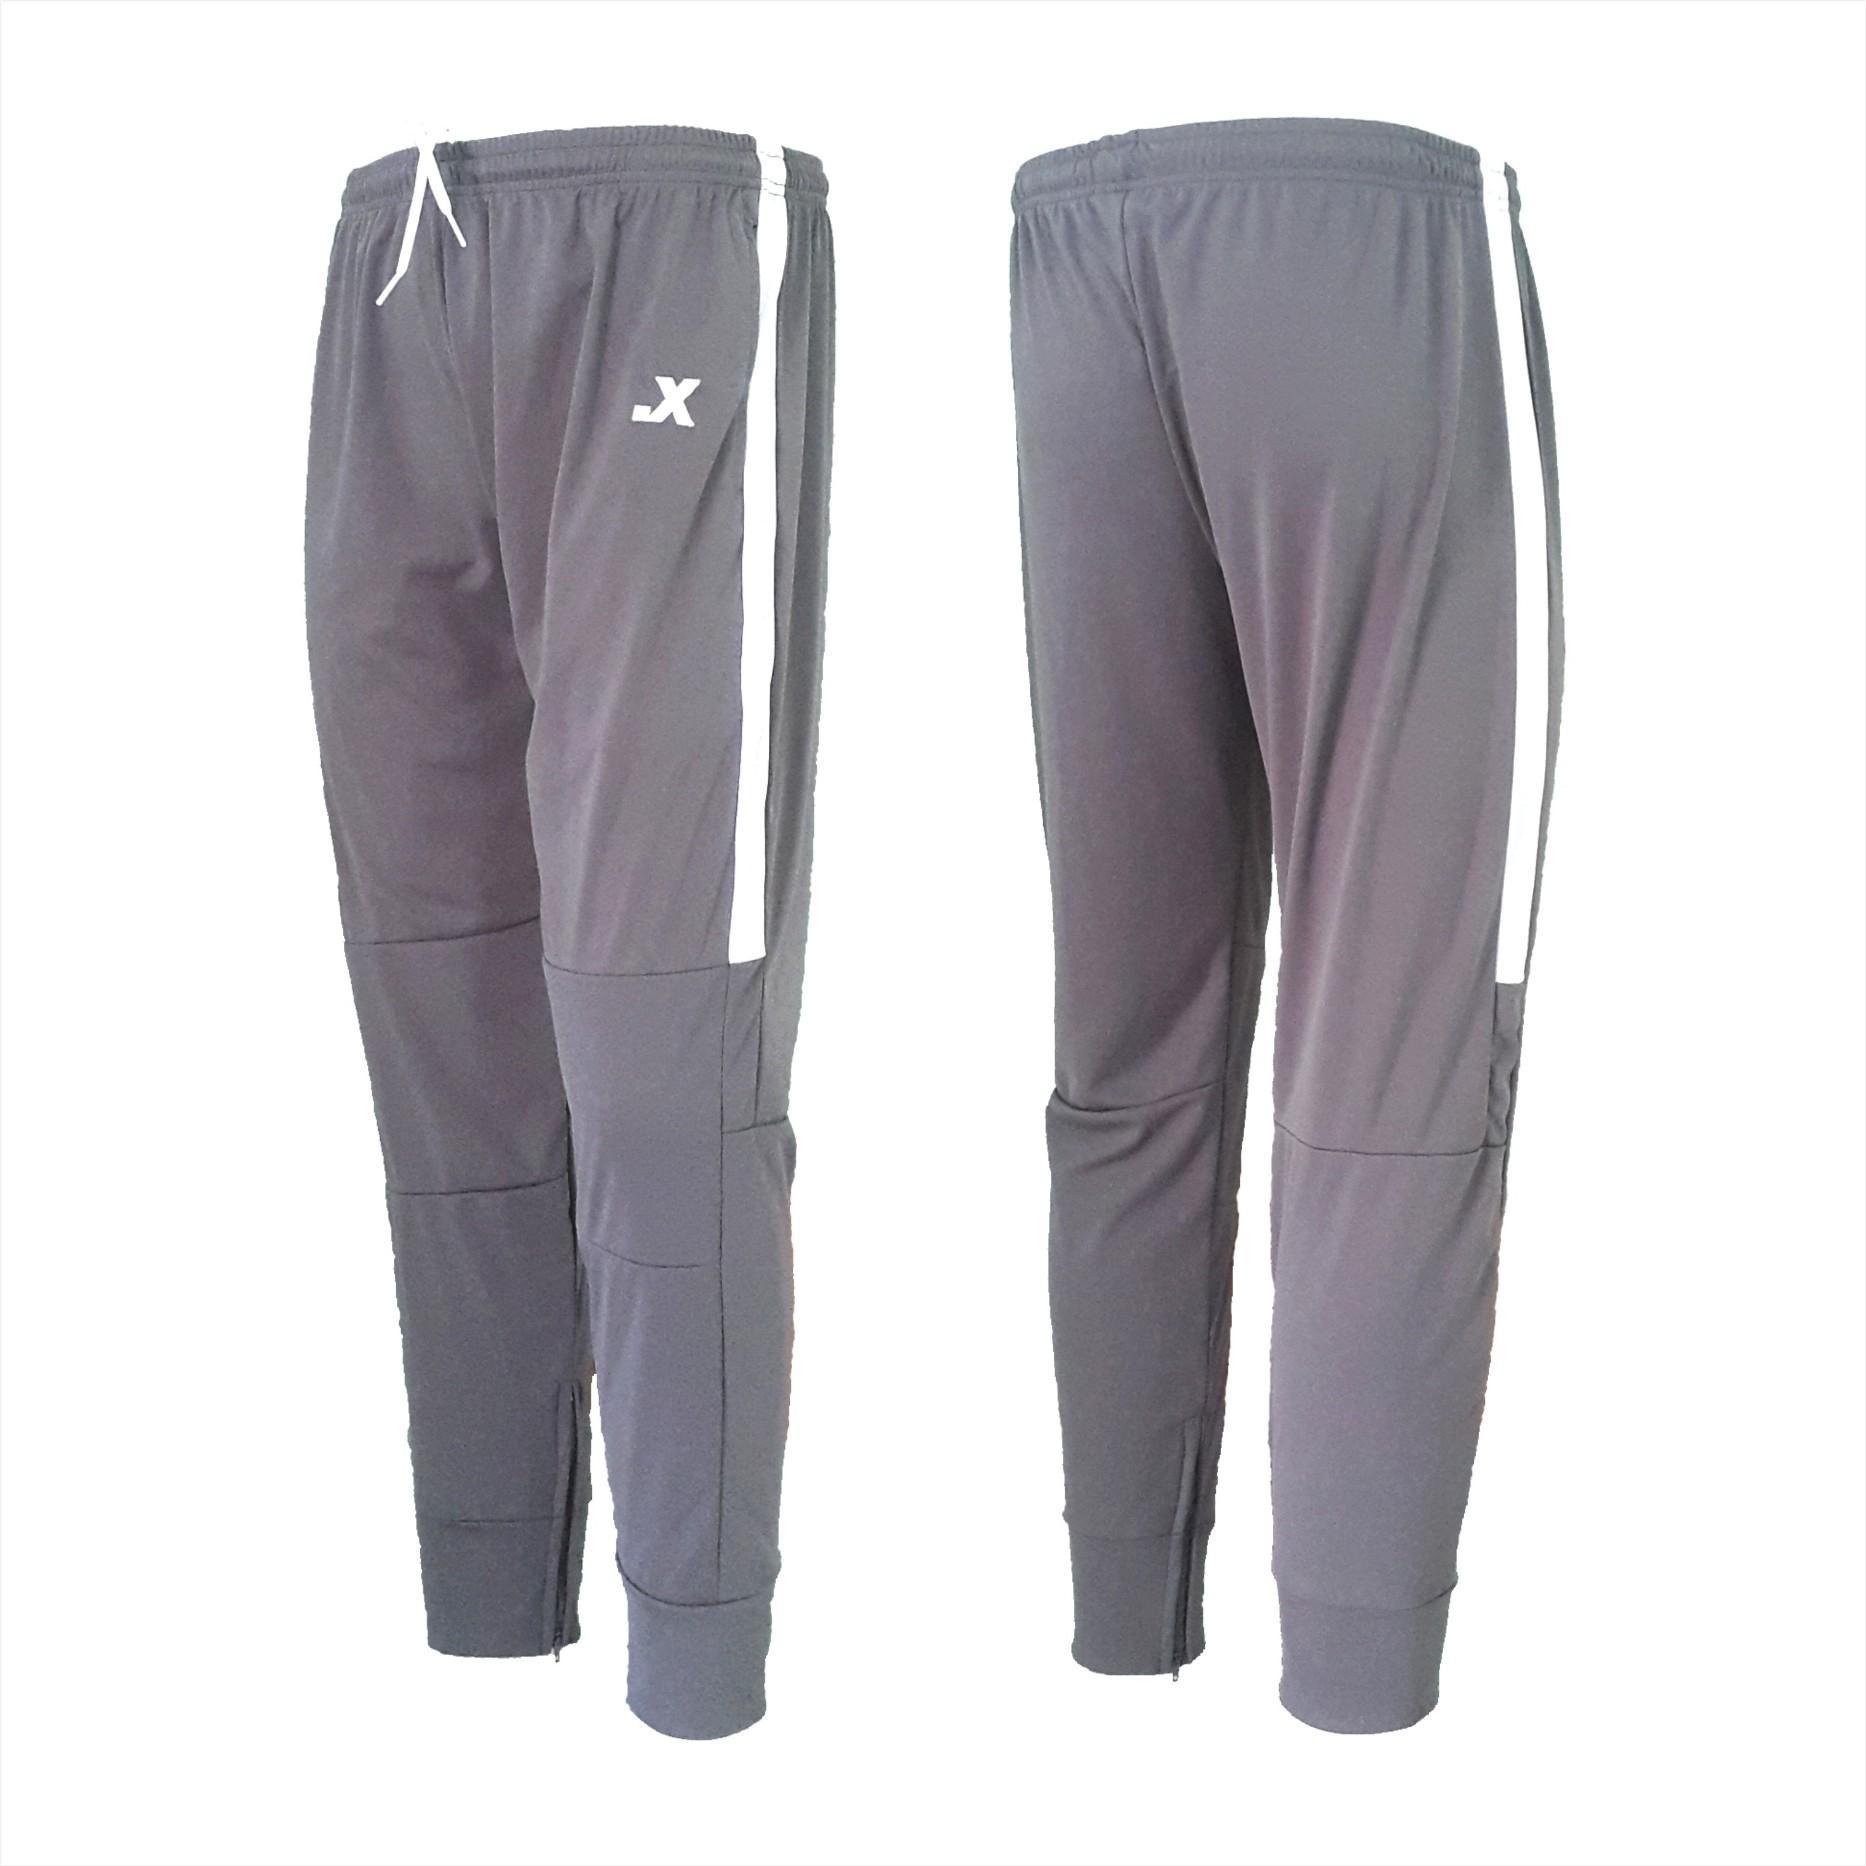 Celana Slim Fit Jogger Training CT 249 Olahraga SweatPants Gym Fitness Lari